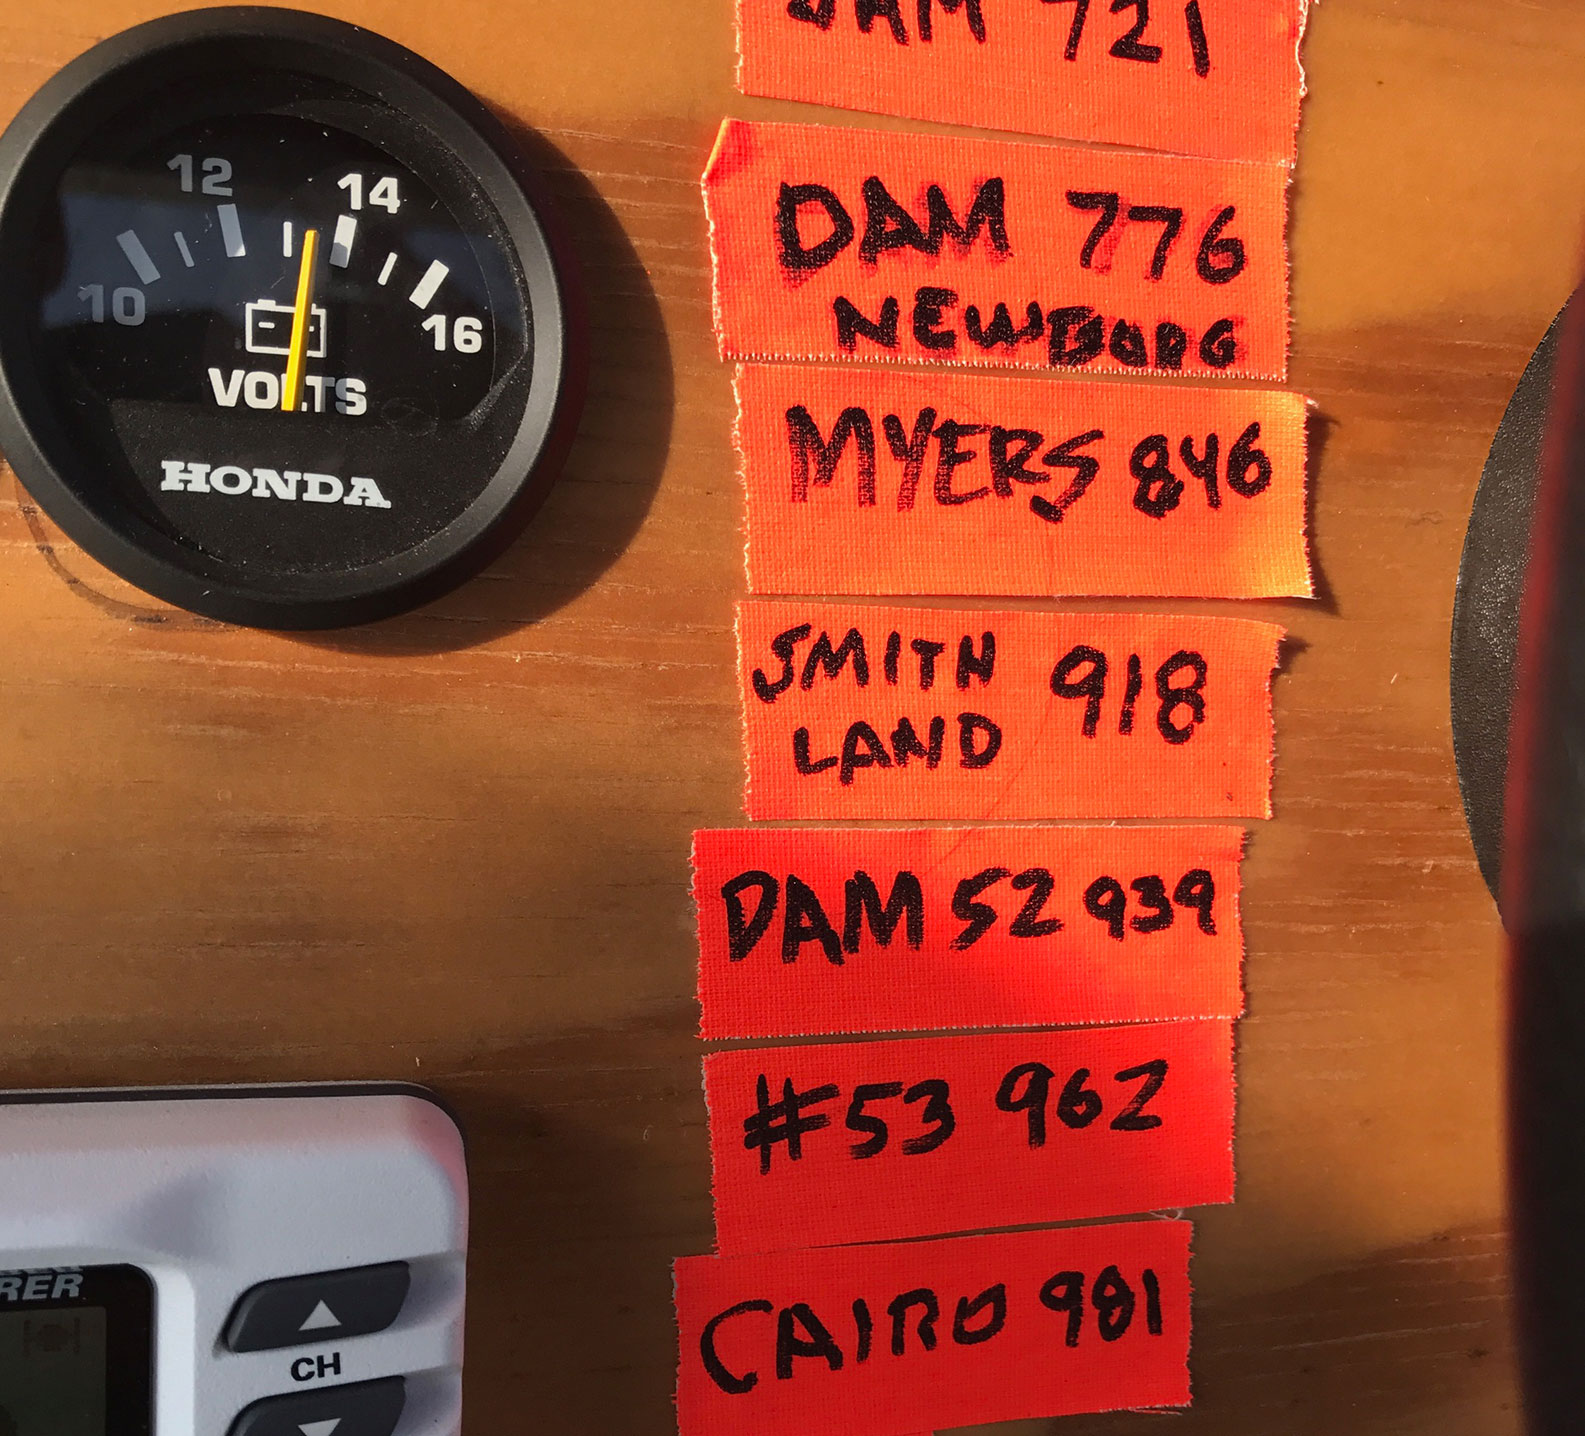 Marc Phelps's running list of locks he's gone through